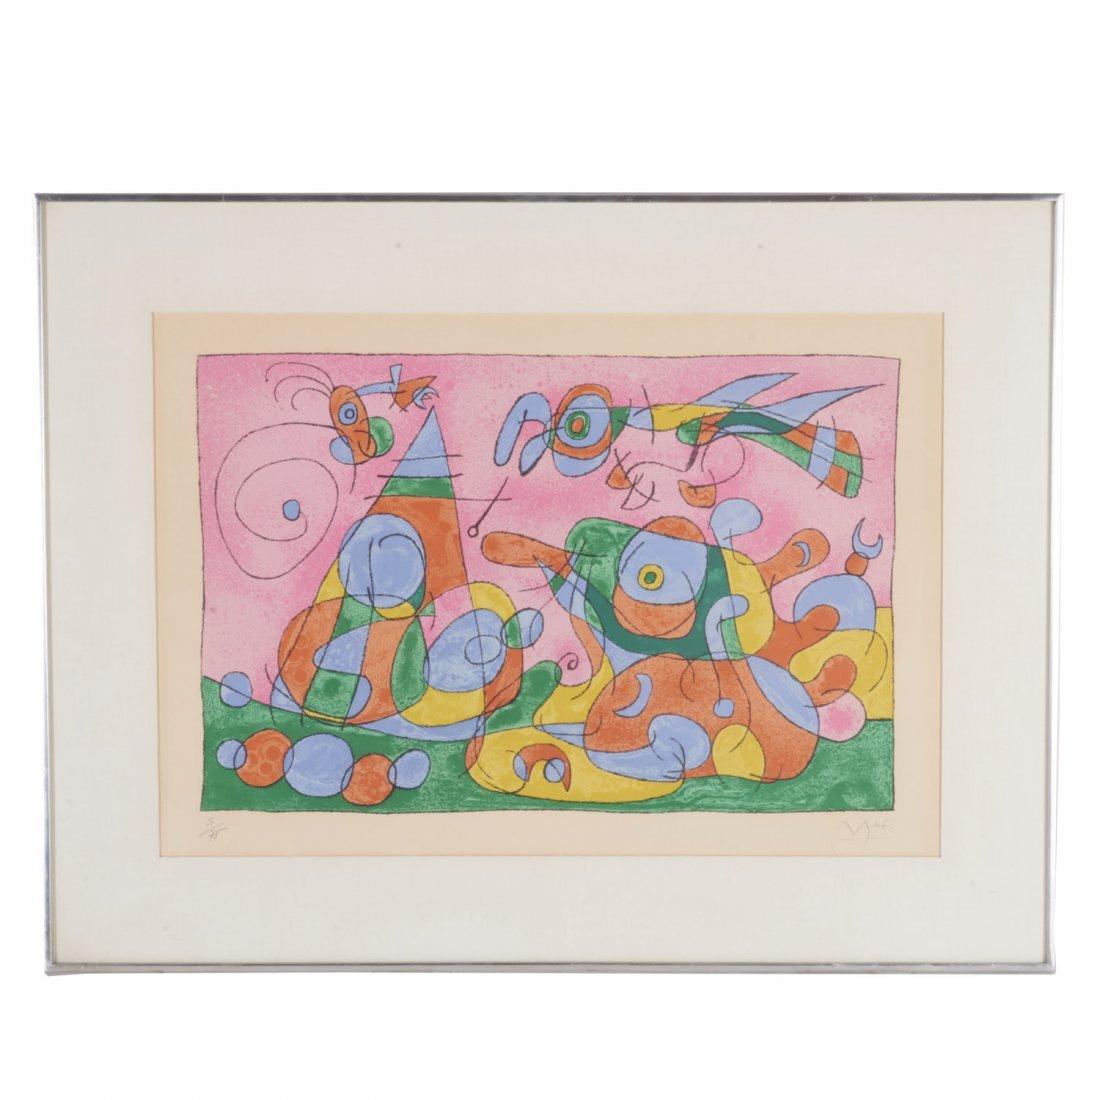 Joan Miro, signed lithograph